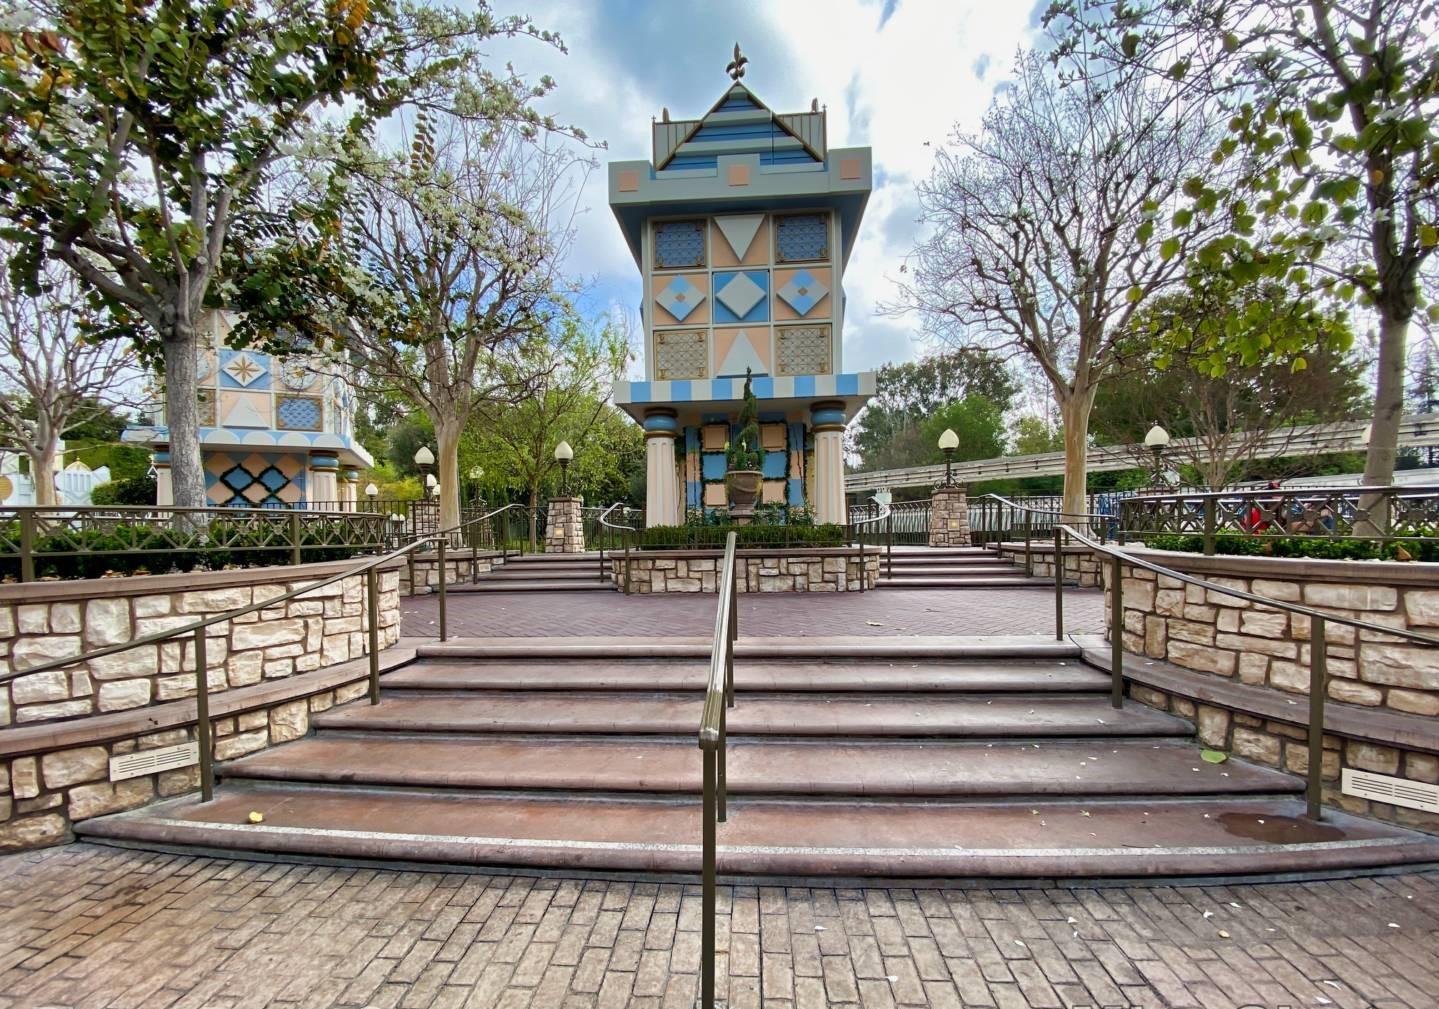 Disneyland-news-fantasyland-small-world-mall-seating-1